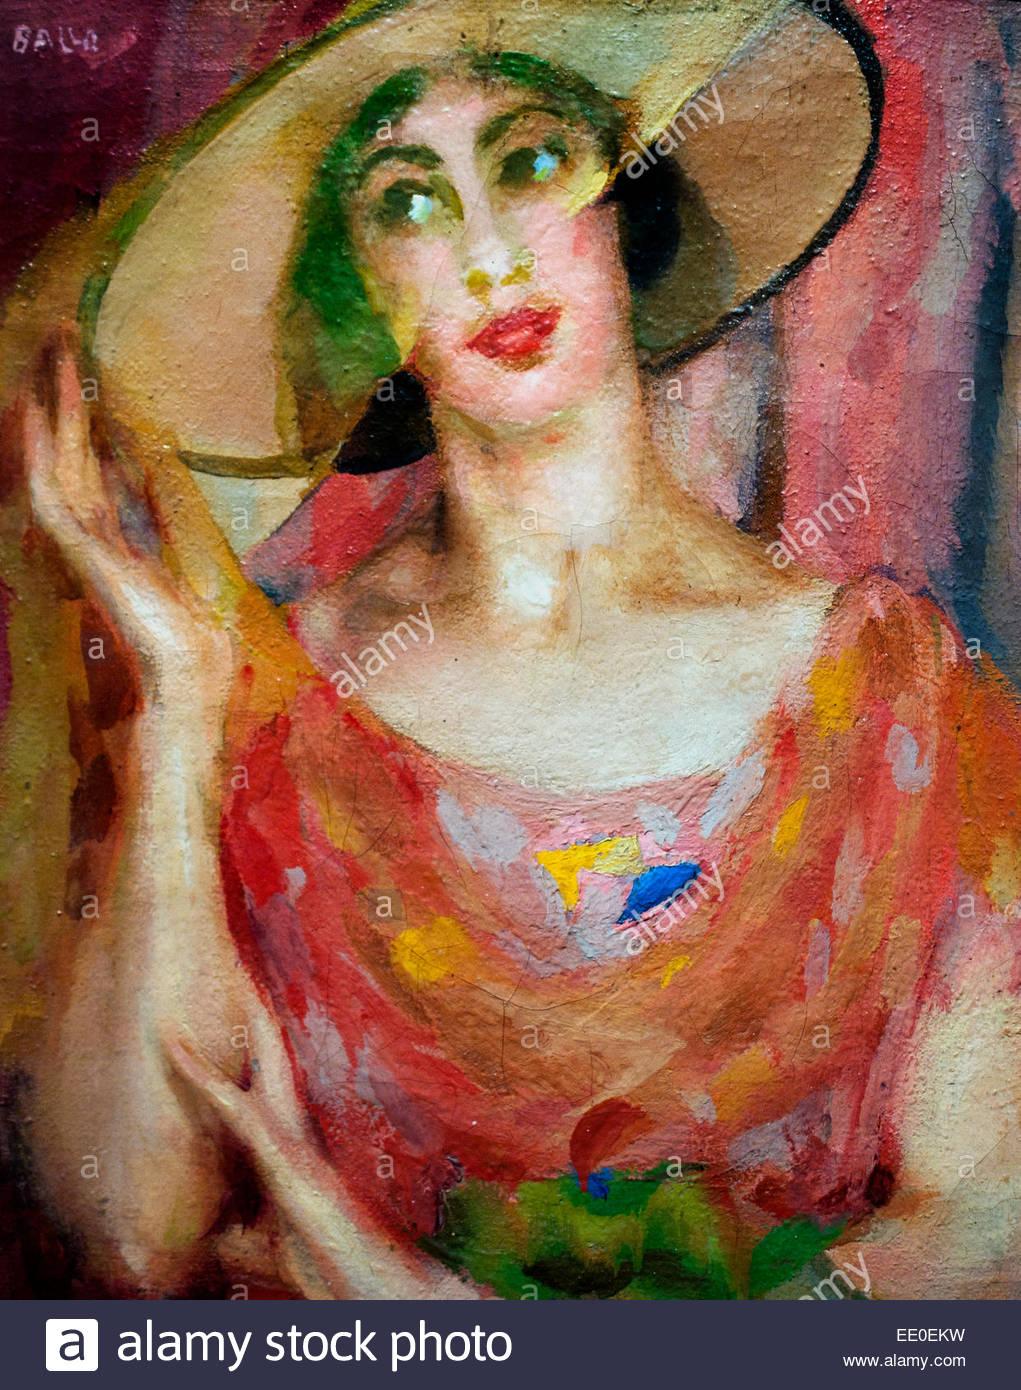 Veli rosa. Ritratto di Luce - Veils pink. Portrait of Light 1922  Giacomo Balla, Italy, Italian. - Stock Image